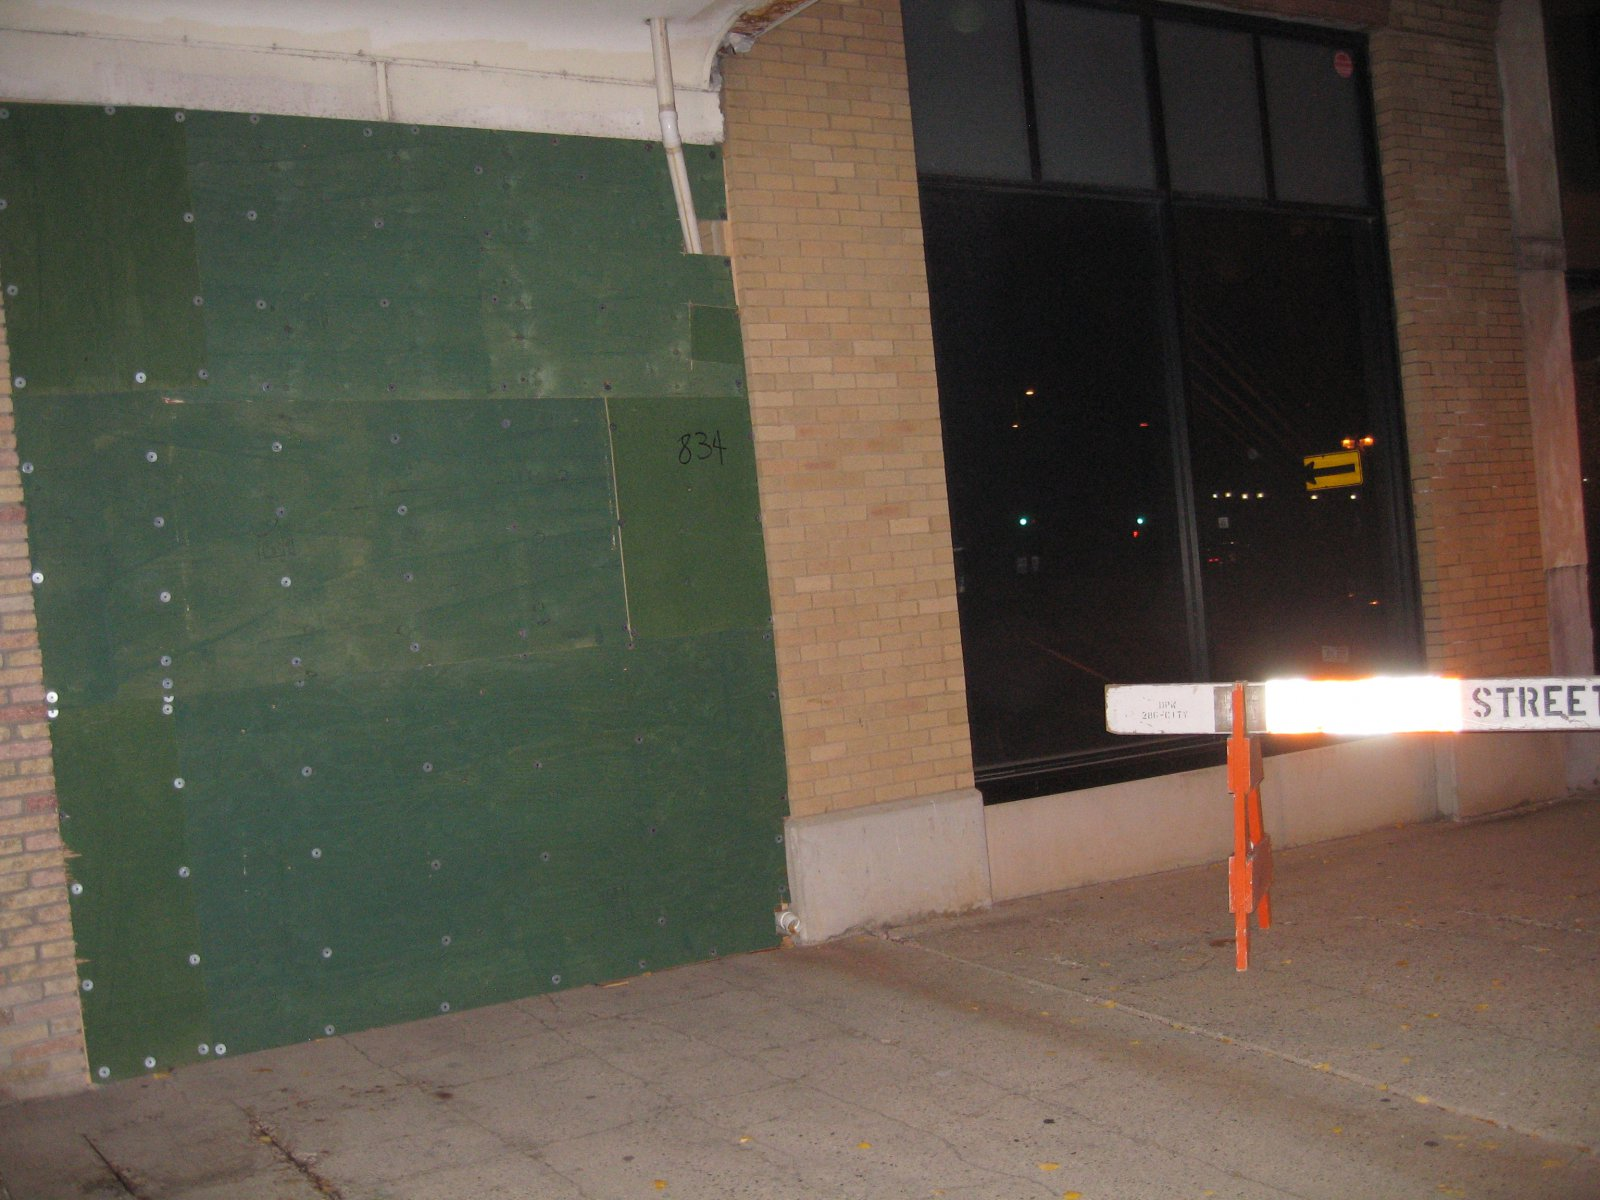 834 N. Plankinton Ave.